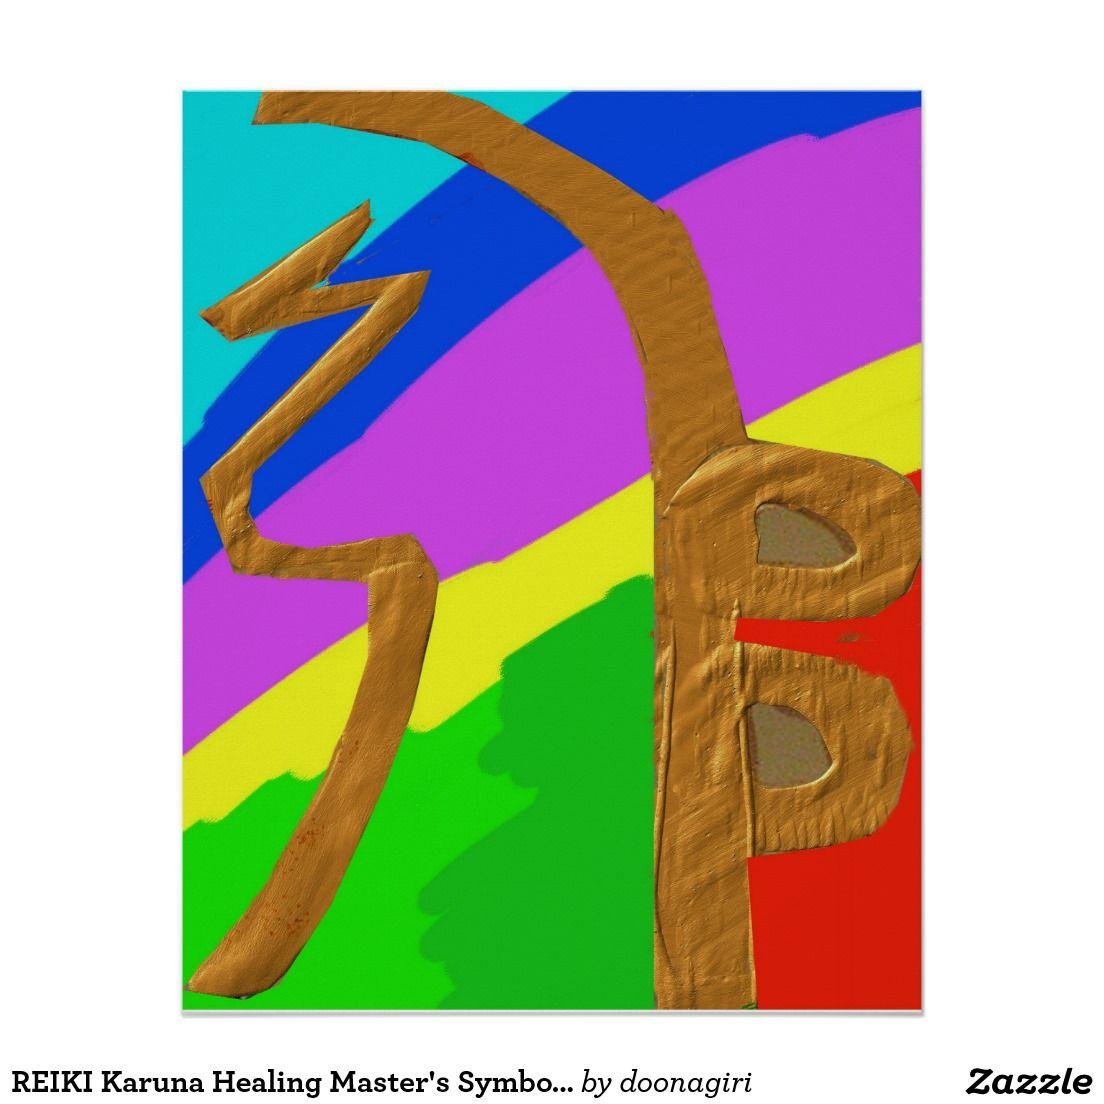 Reiki karuna healing masters symbols poster symbols reiki karuna healing masters symbols poster biocorpaavc